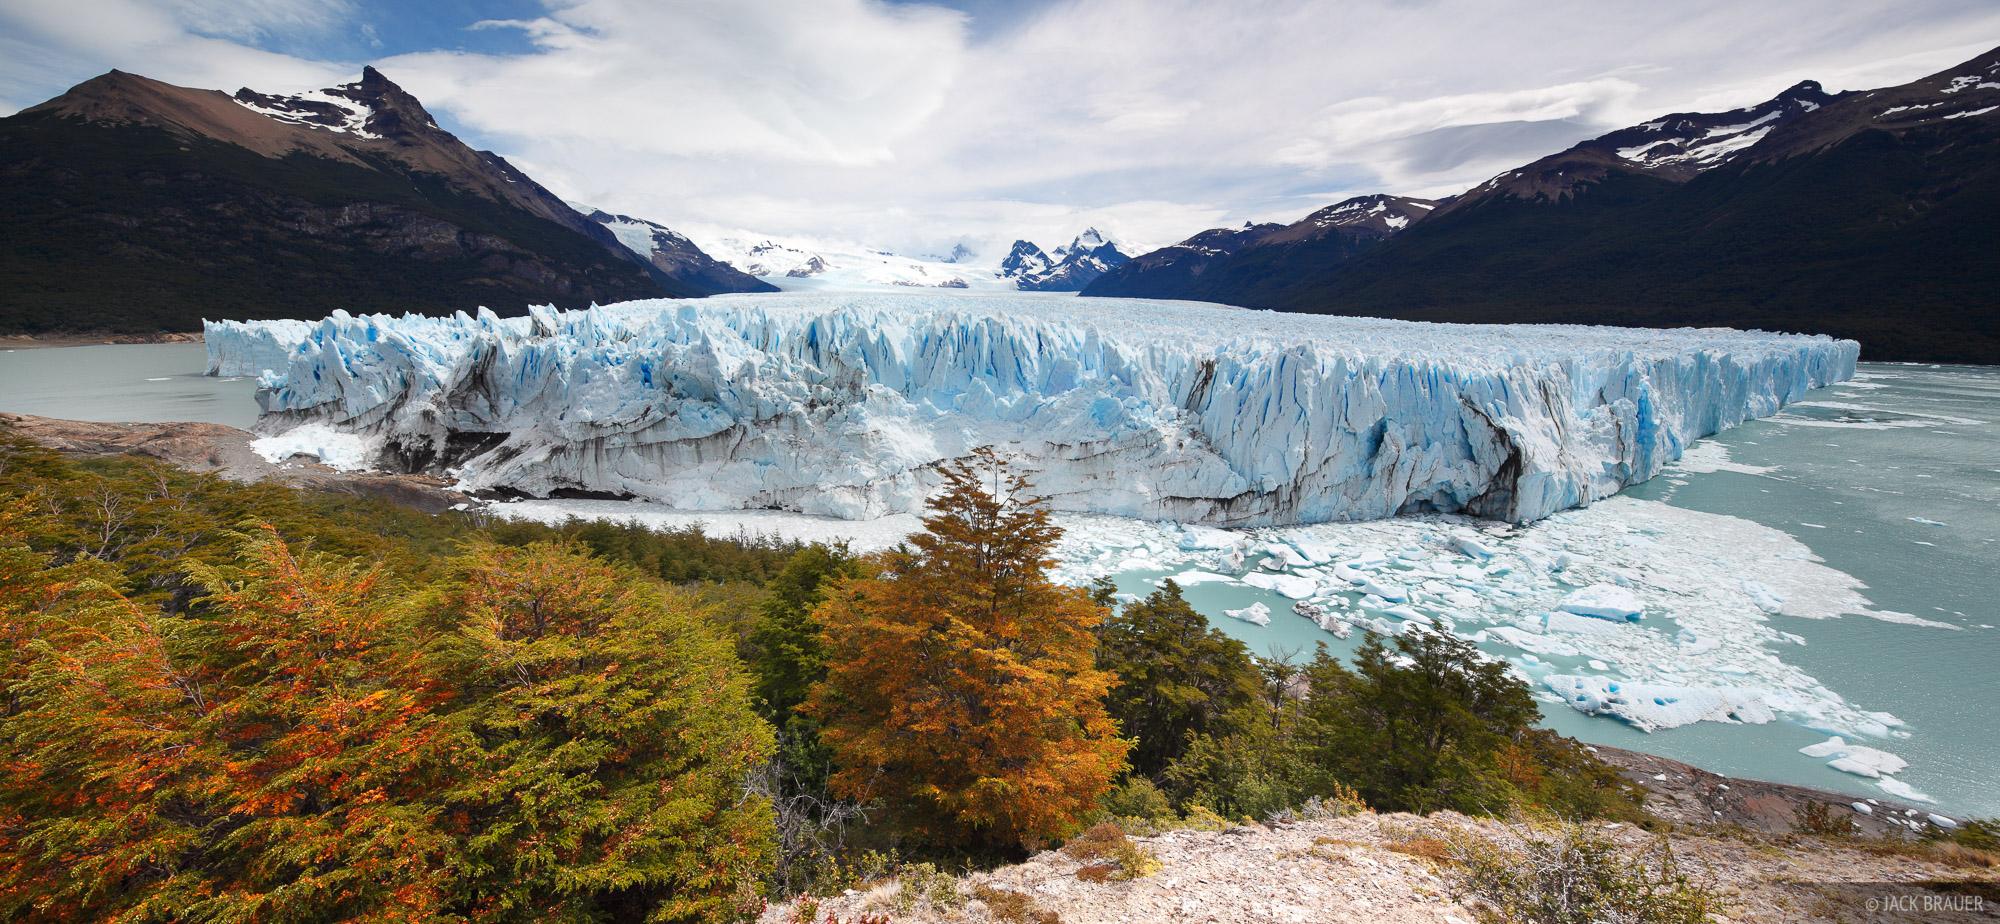 Glaciar Perito Moreno, panorama, Argentina, Patagonia, glacier, El Calafate, Lago Argentino, photo